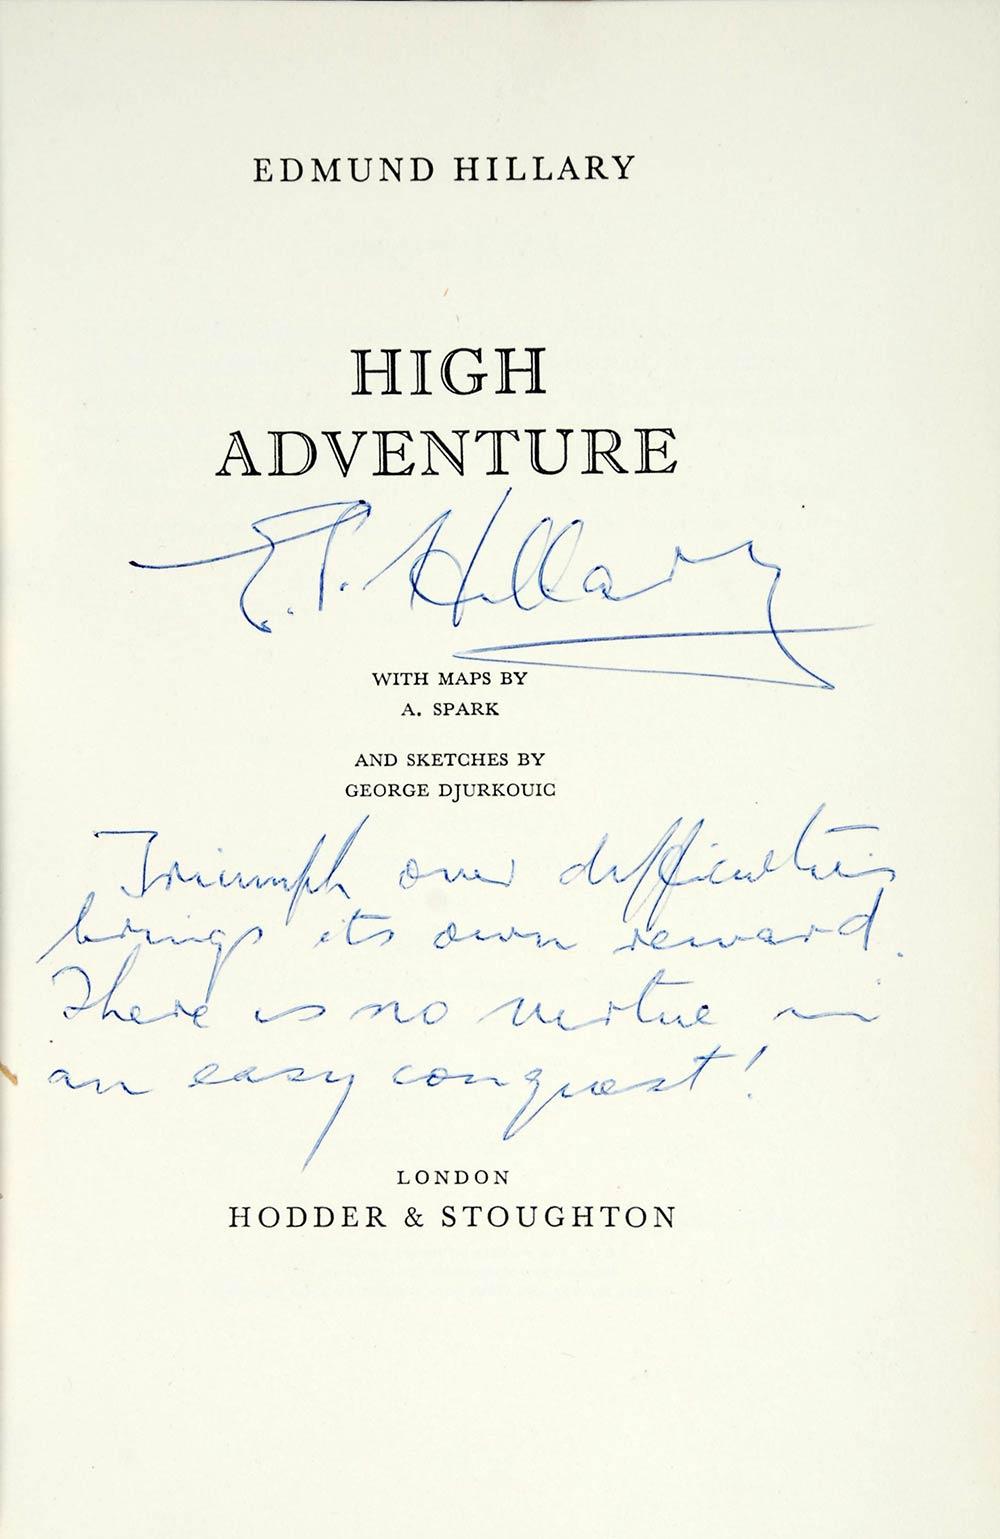 Edmund Hillary. <em>High adventure</em>. London: Hodder & Stoughton, 1955.